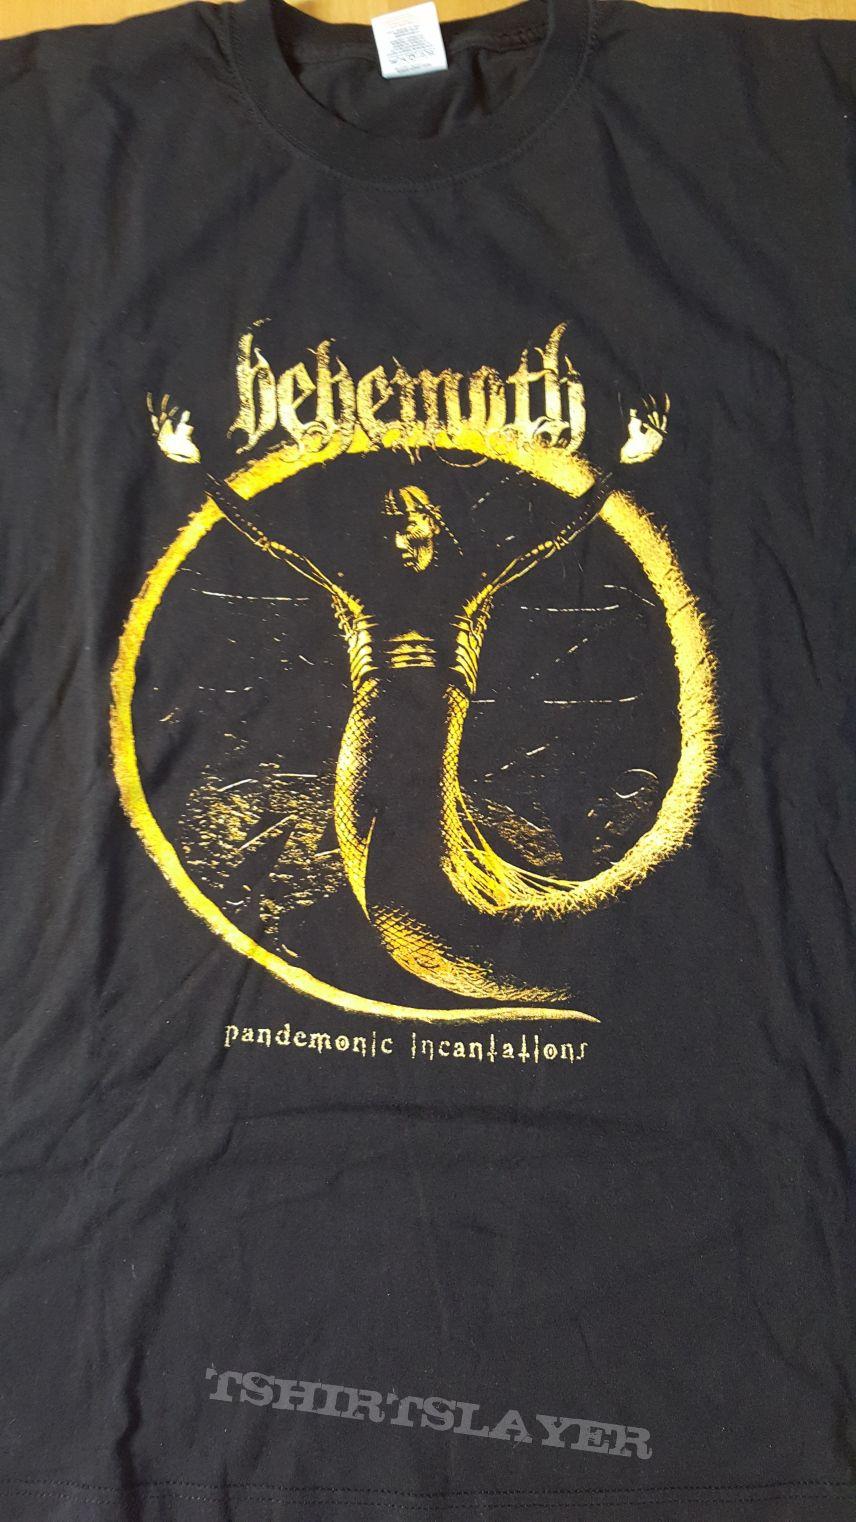 Behemoth - Pandemonic Incantations LS